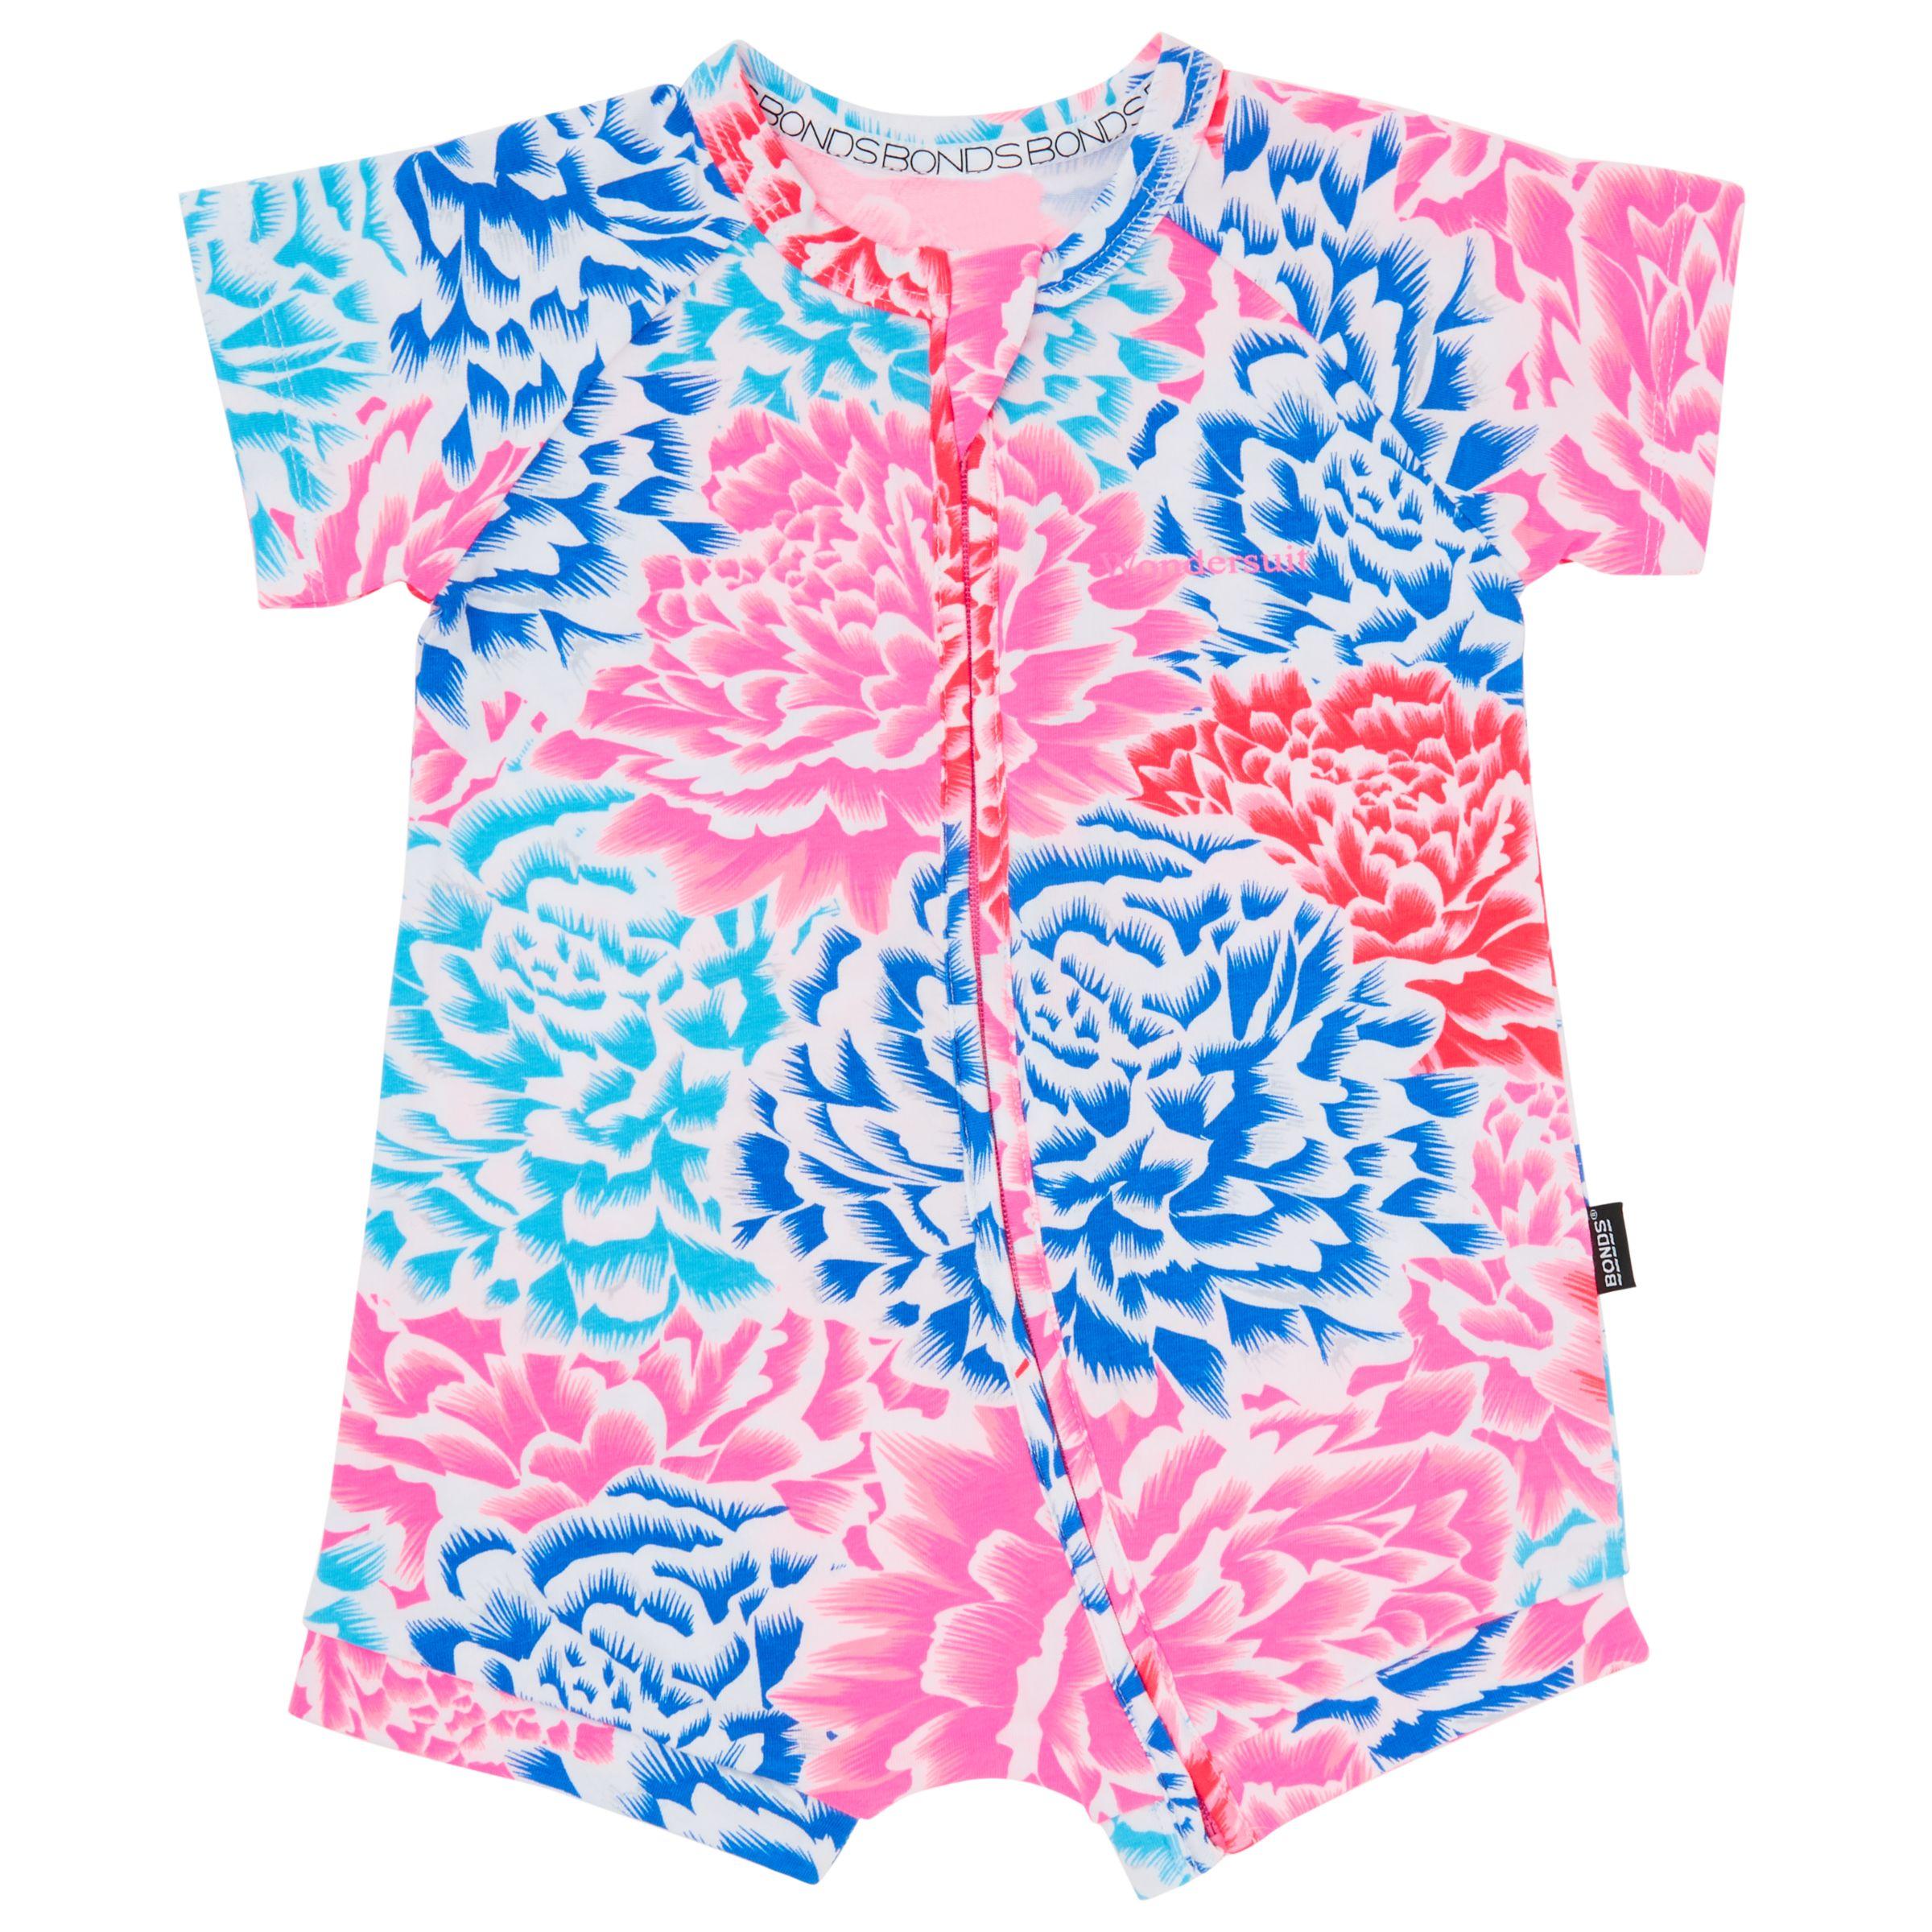 680d9dcd82 Bonds Baby Zip Wondersuit Tokyo Romper, Pink/Multi at John Lewis ...